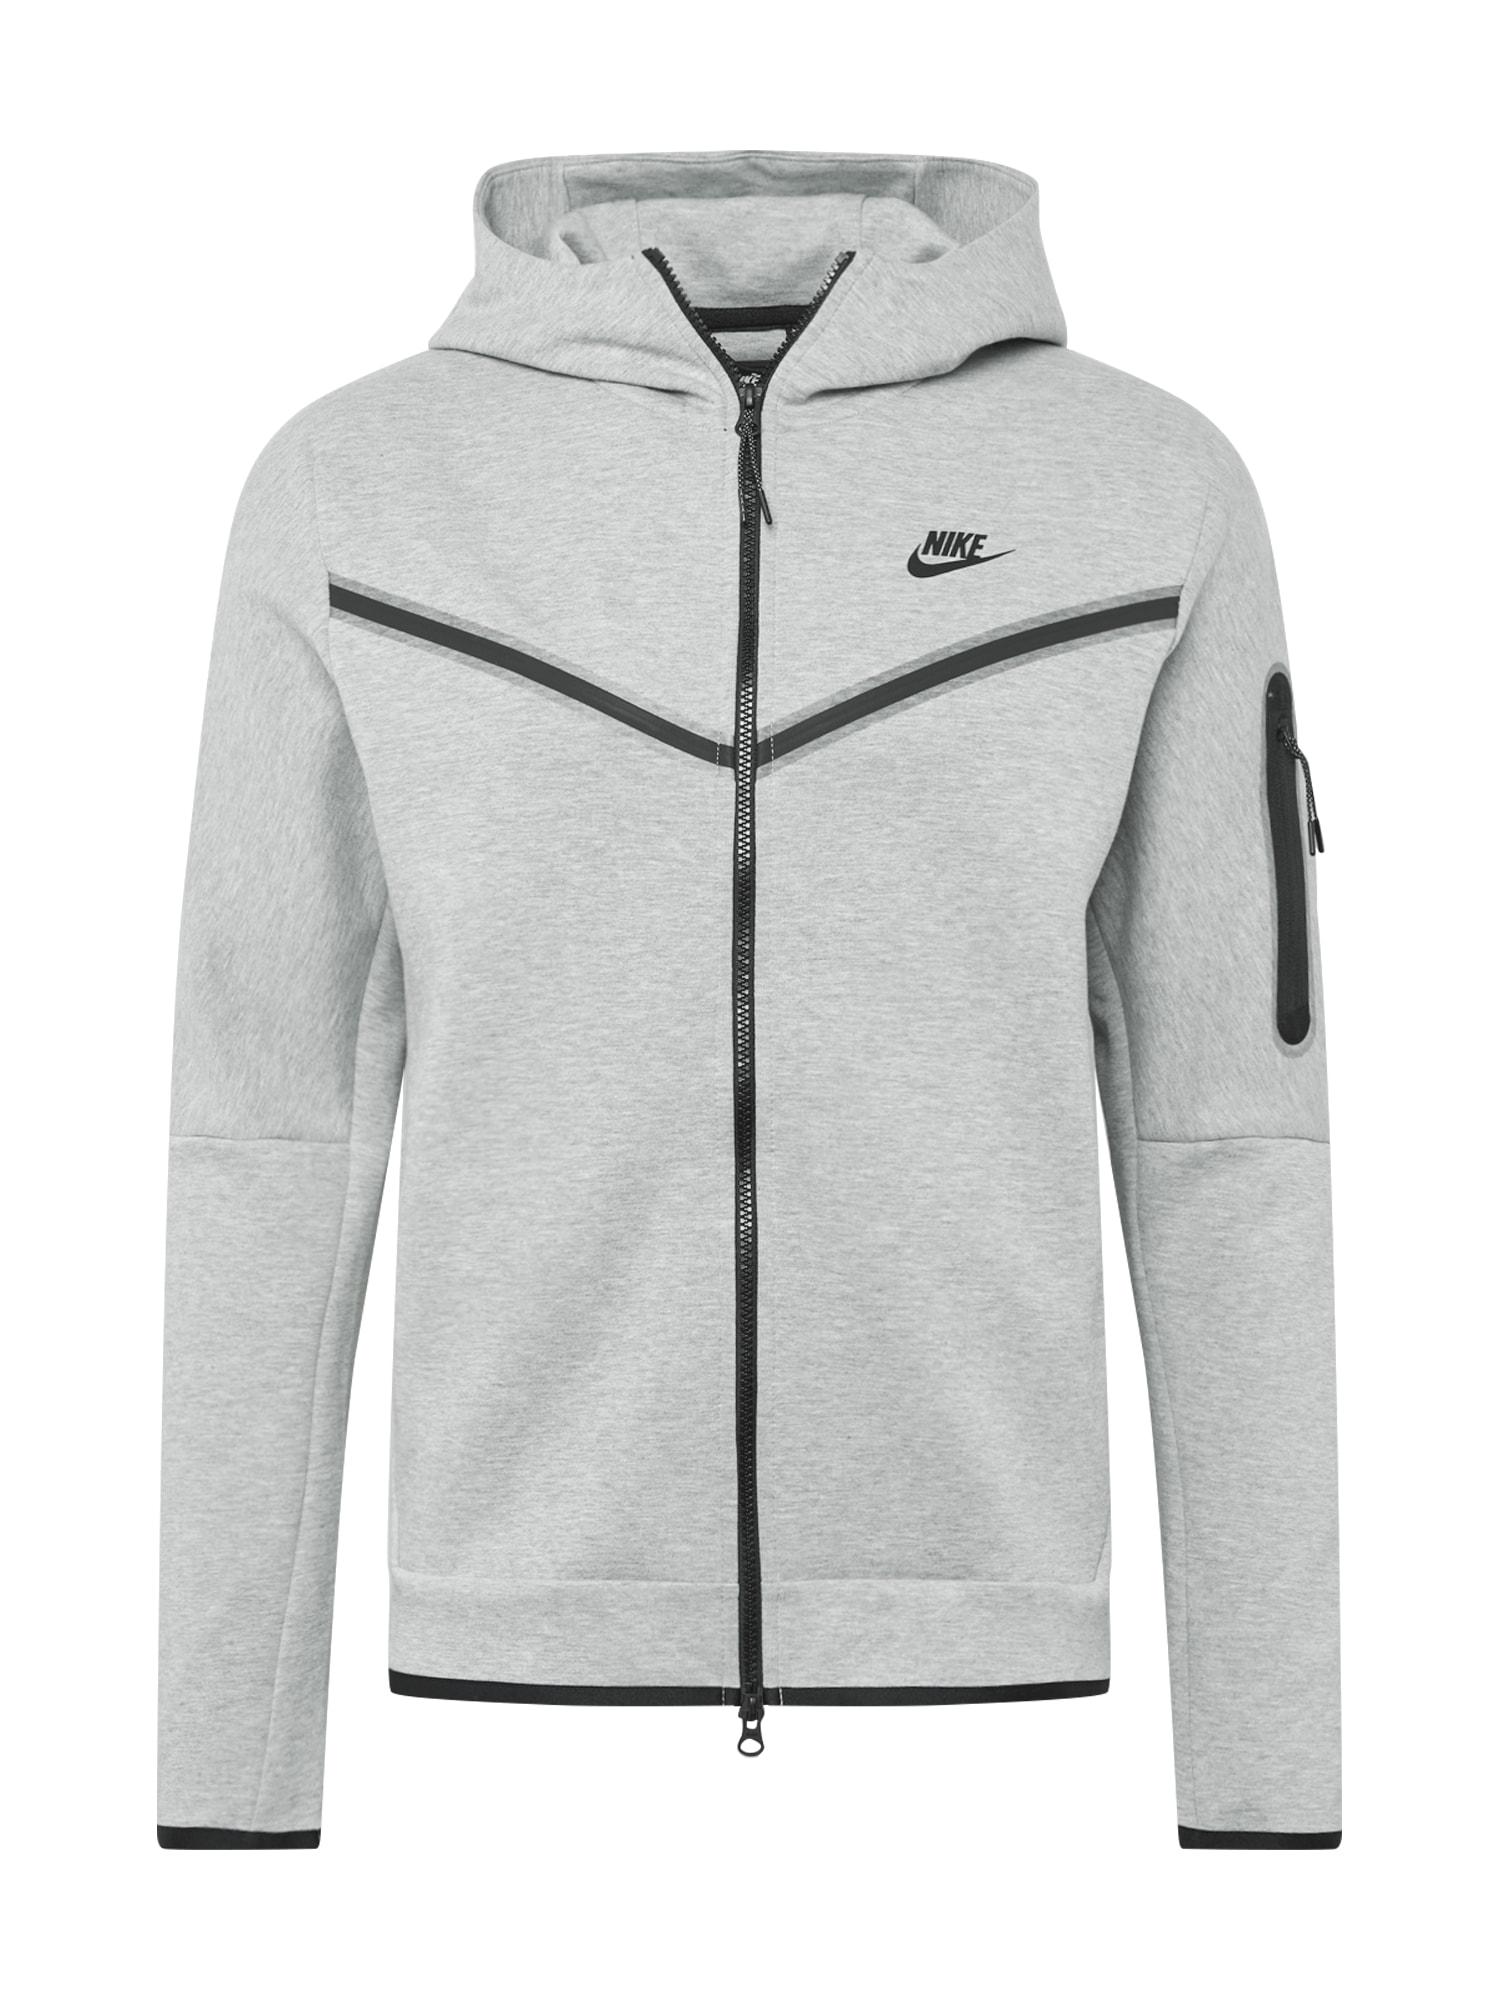 Nike Sportswear Džemperis juoda / pilka